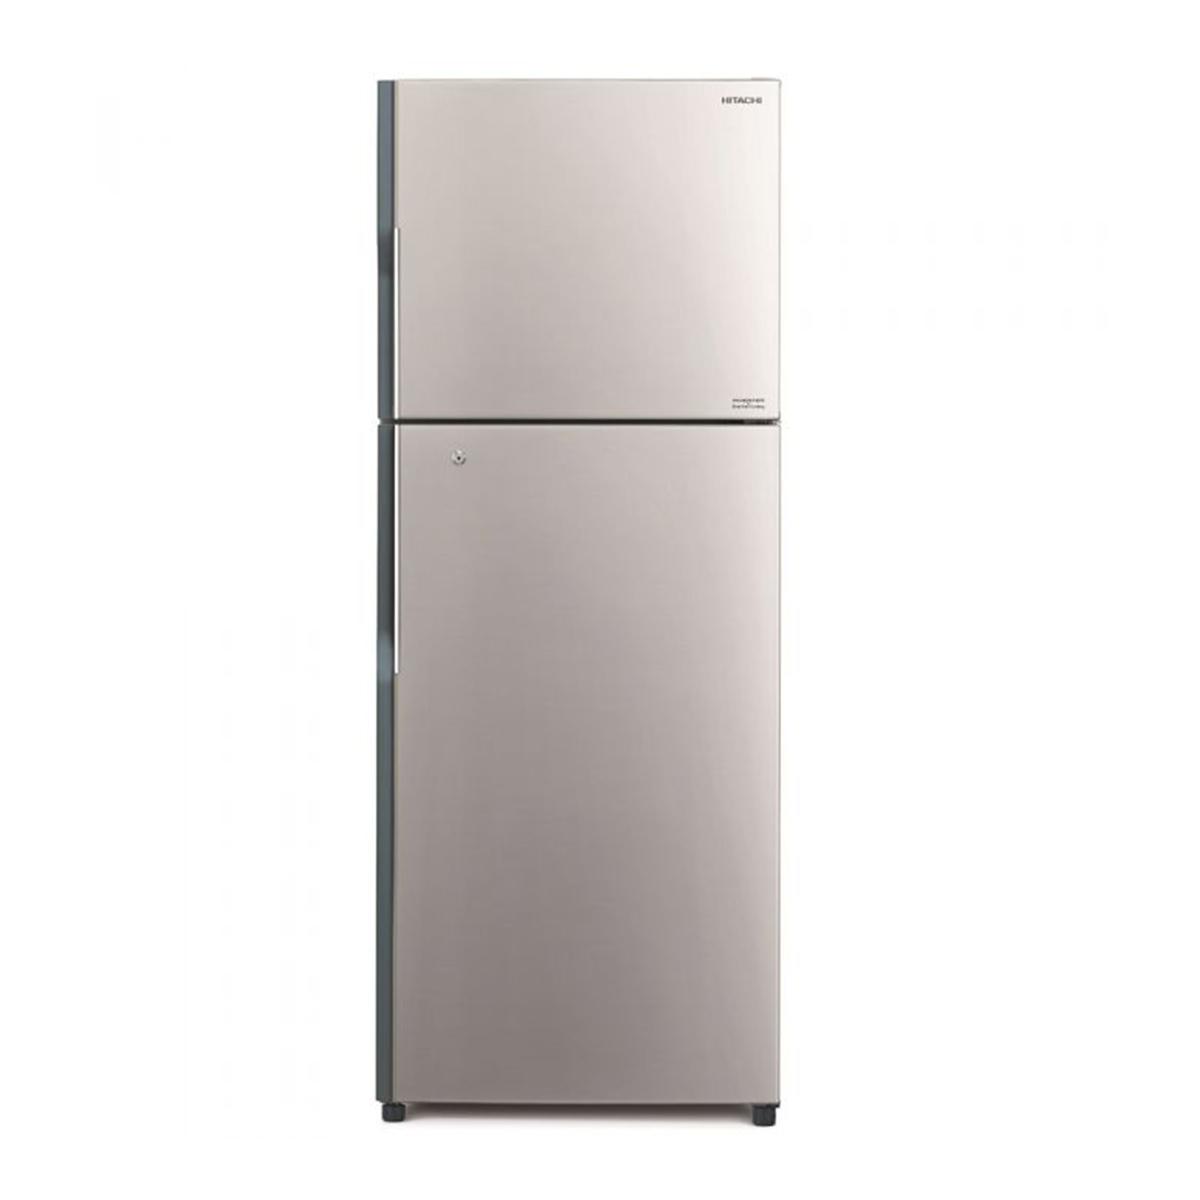 Image result for Hitachi refrigerator images hd